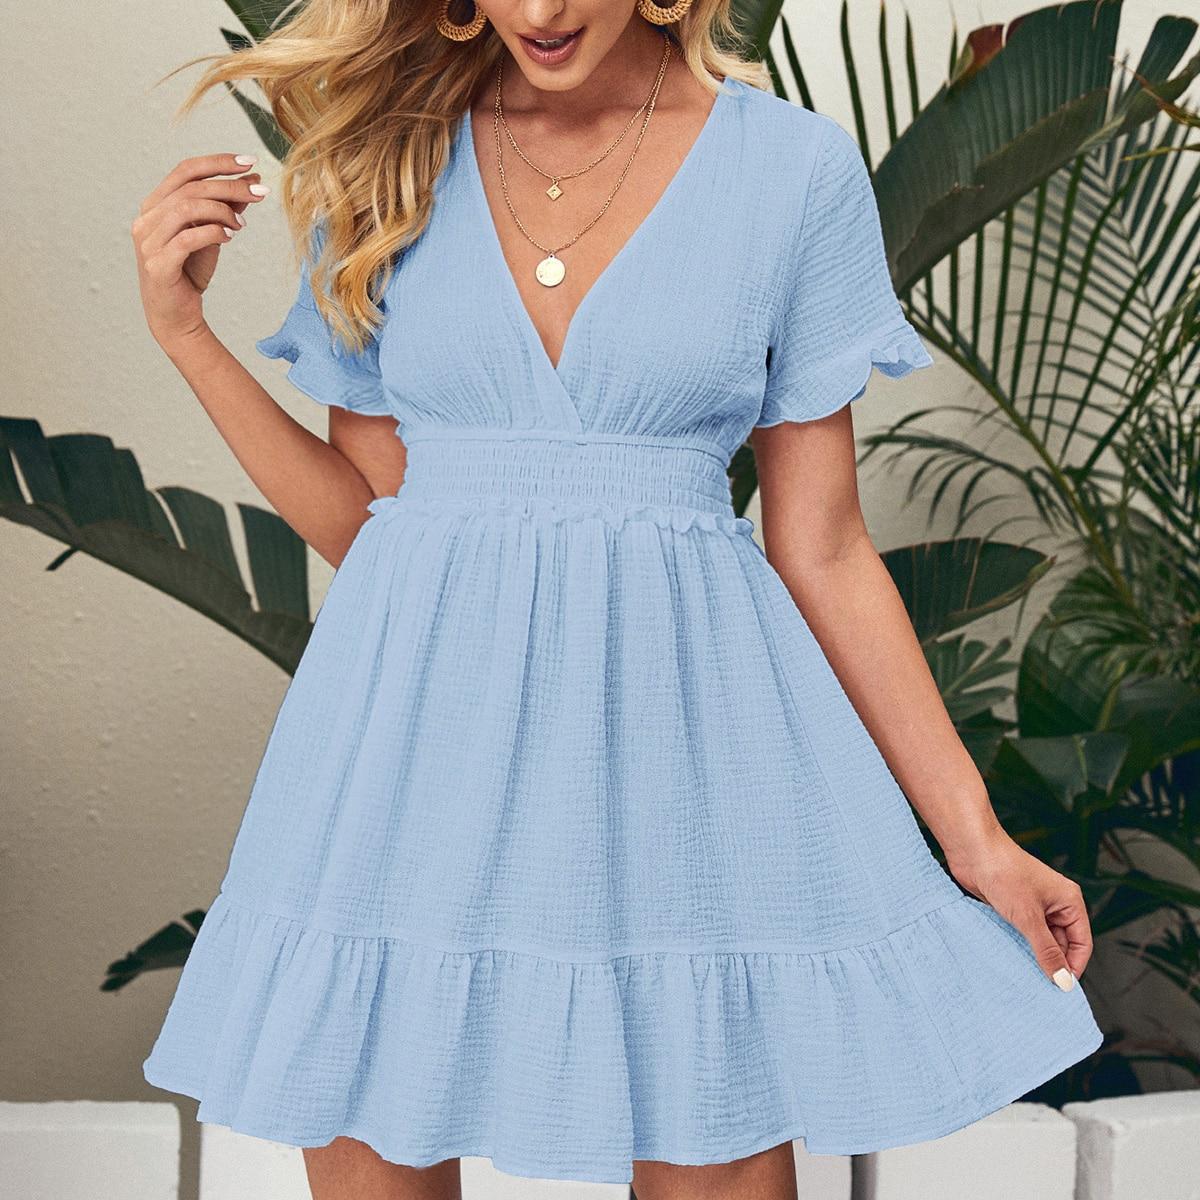 Платье с воланами на рукавах SheIn swdress07210401535